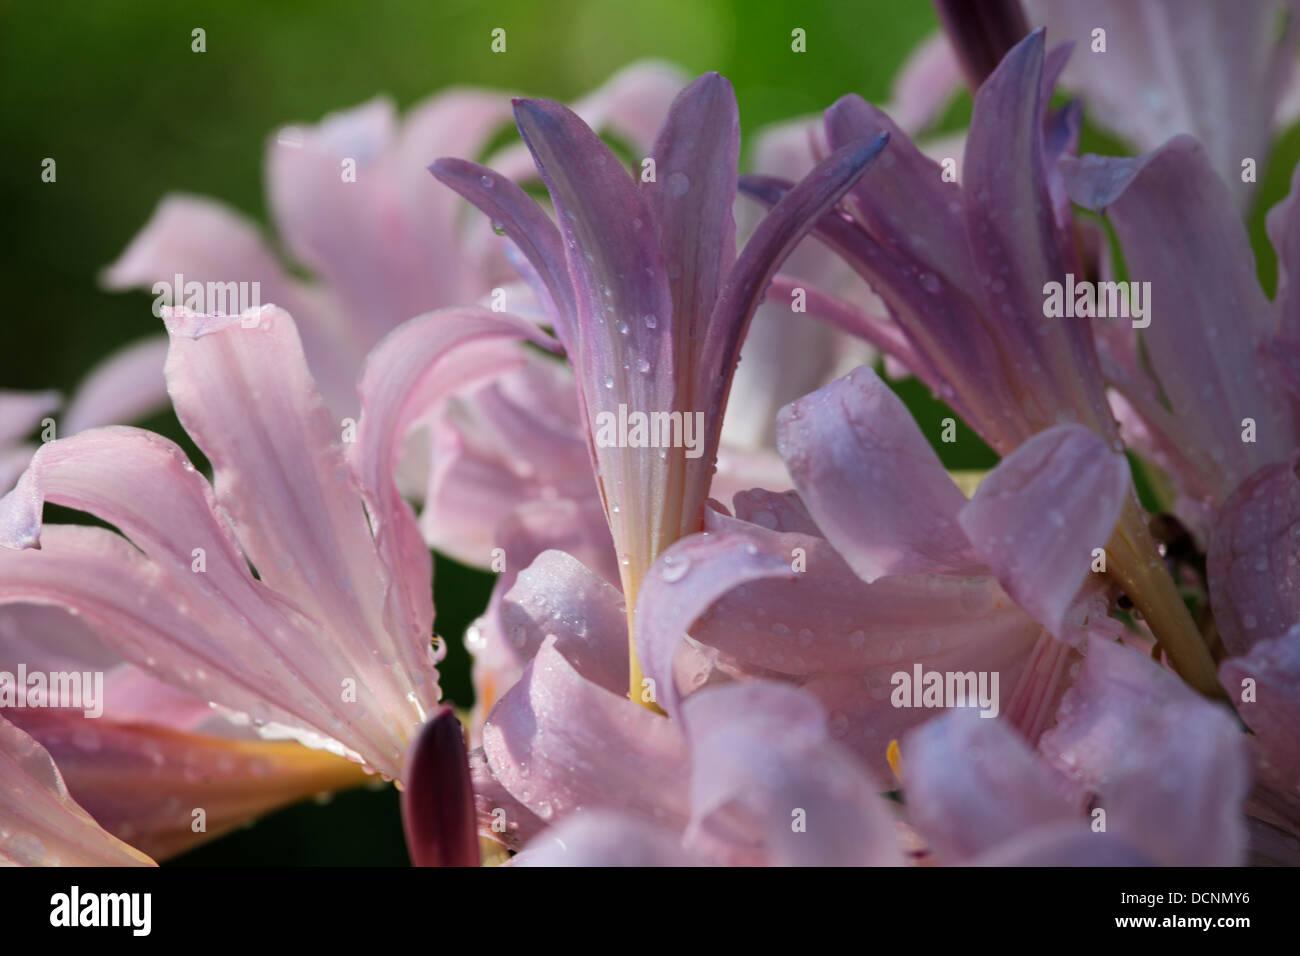 Pink Naked Lady Flowers Stock Photo 59484410 Alamy